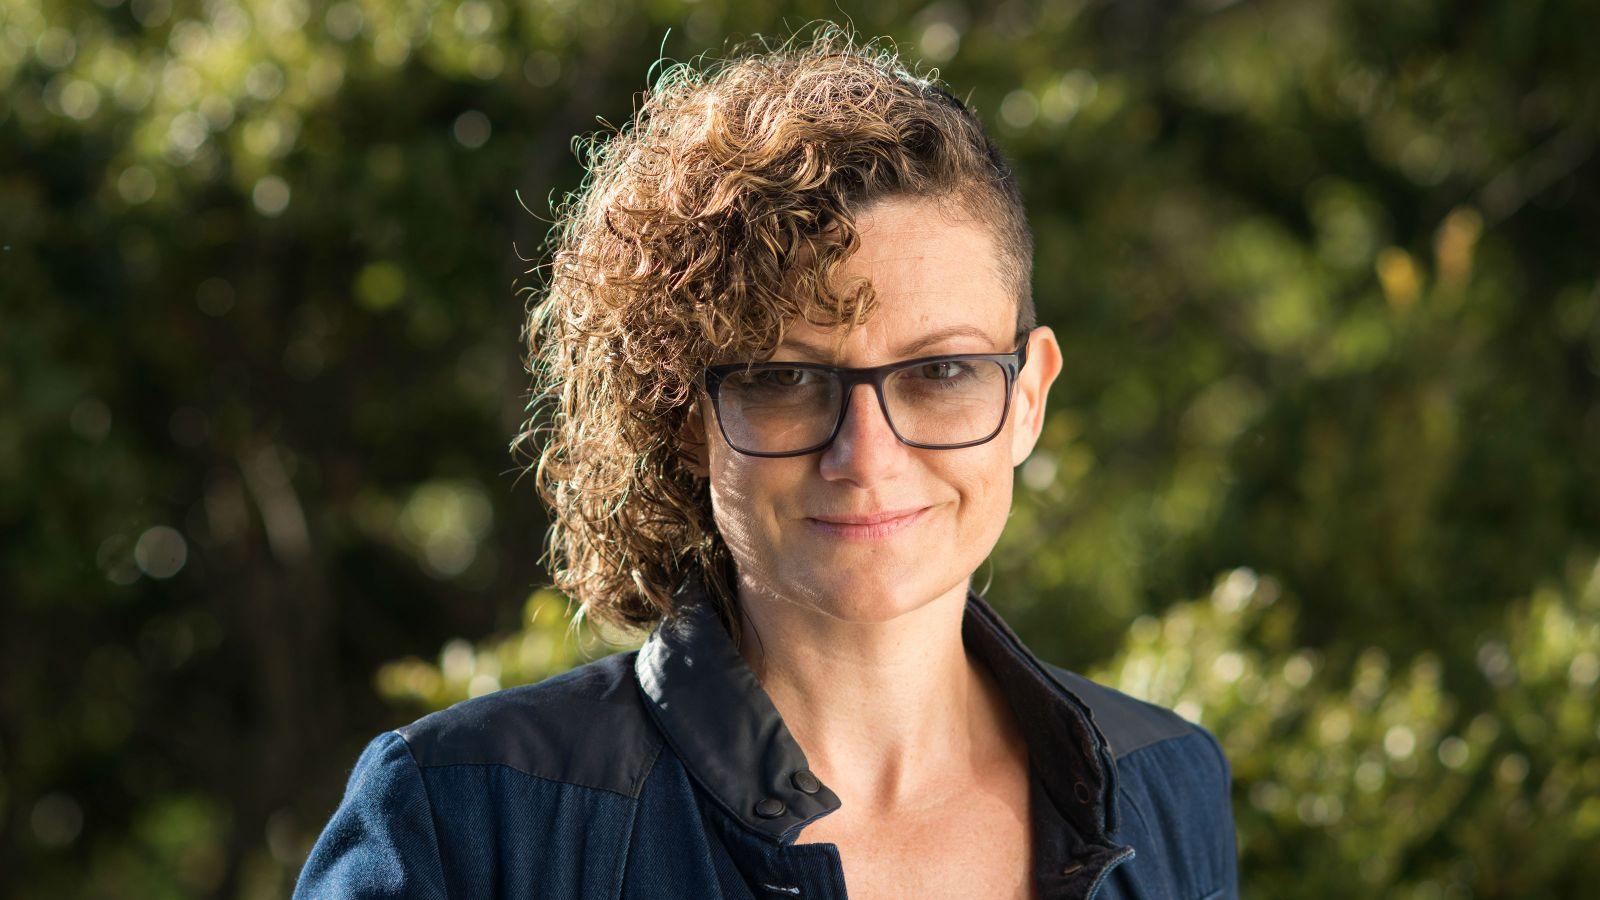 locational photo of Linda Wilkin-Krug on the Kelburn Campus